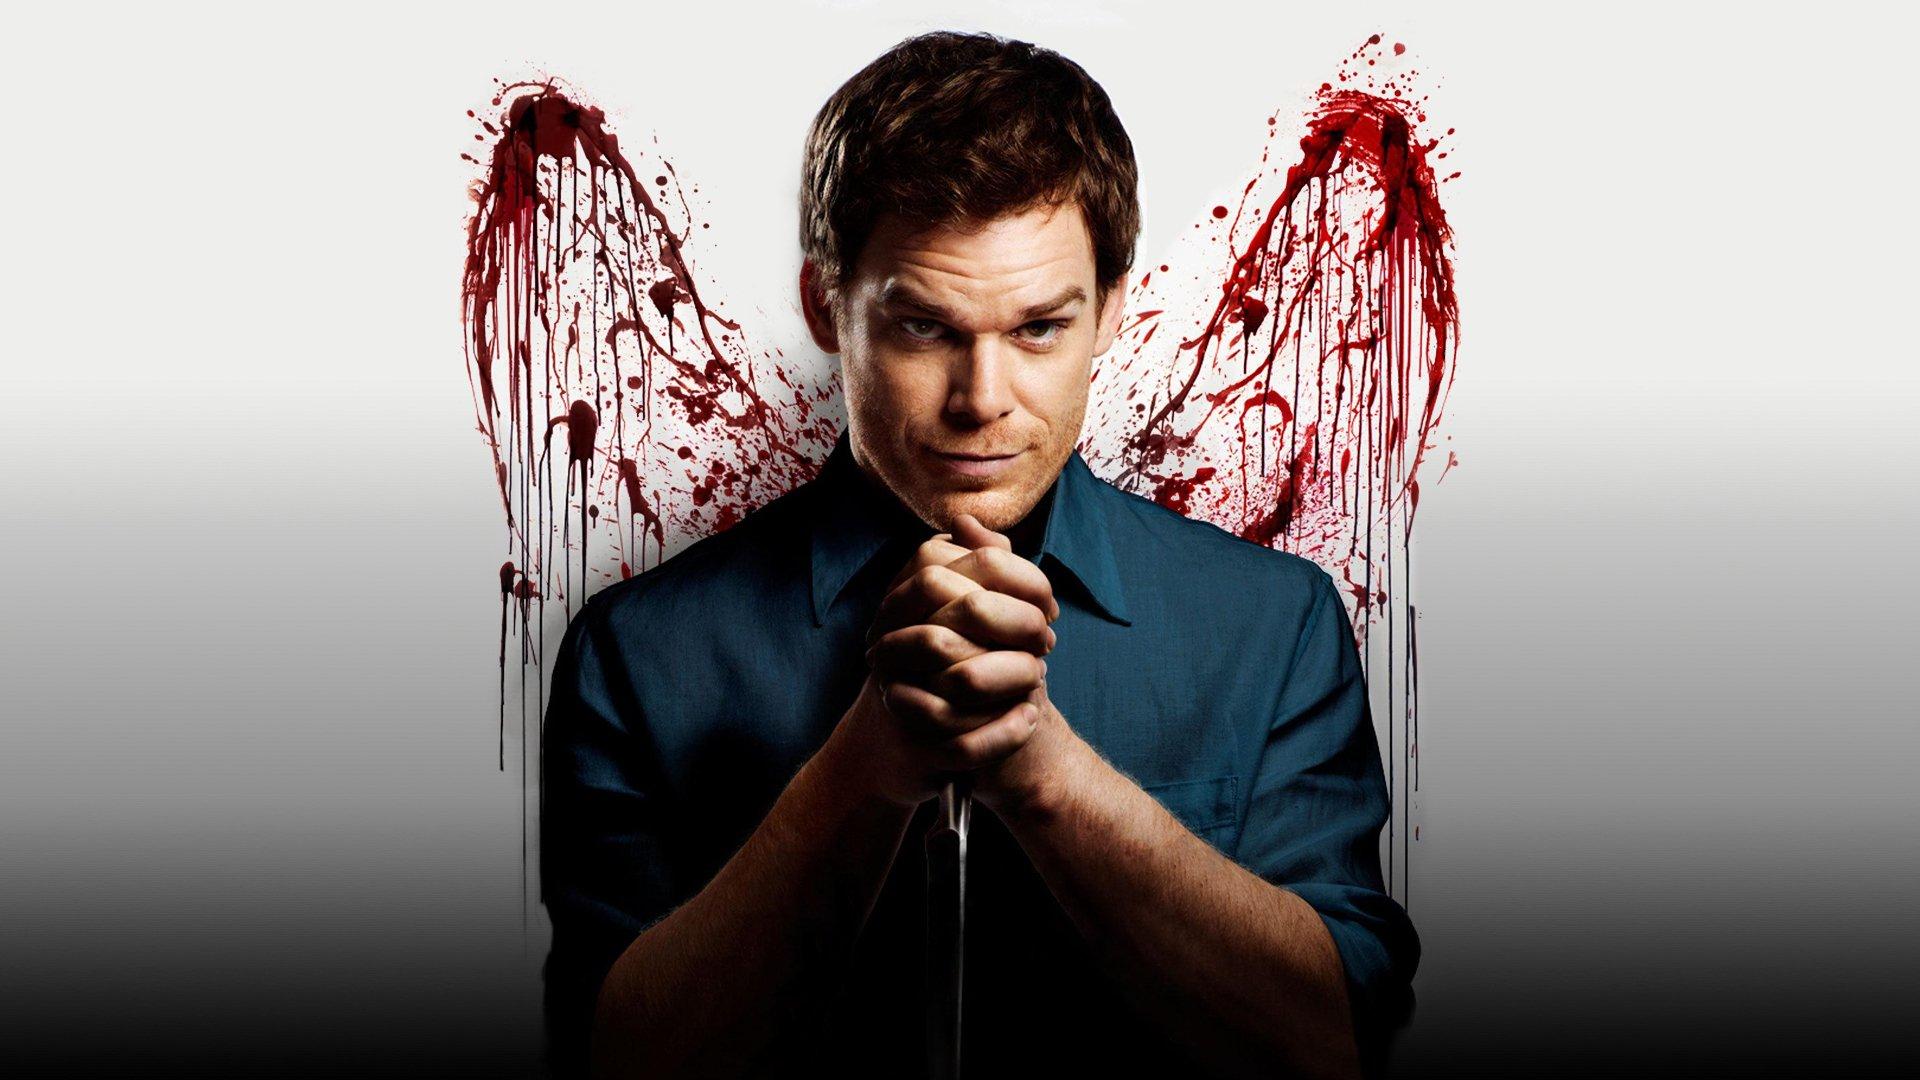 TV-program - Dexter  Michael C. Hall Dexter (TV Show) Dexter Morgan Blod Bakgrund